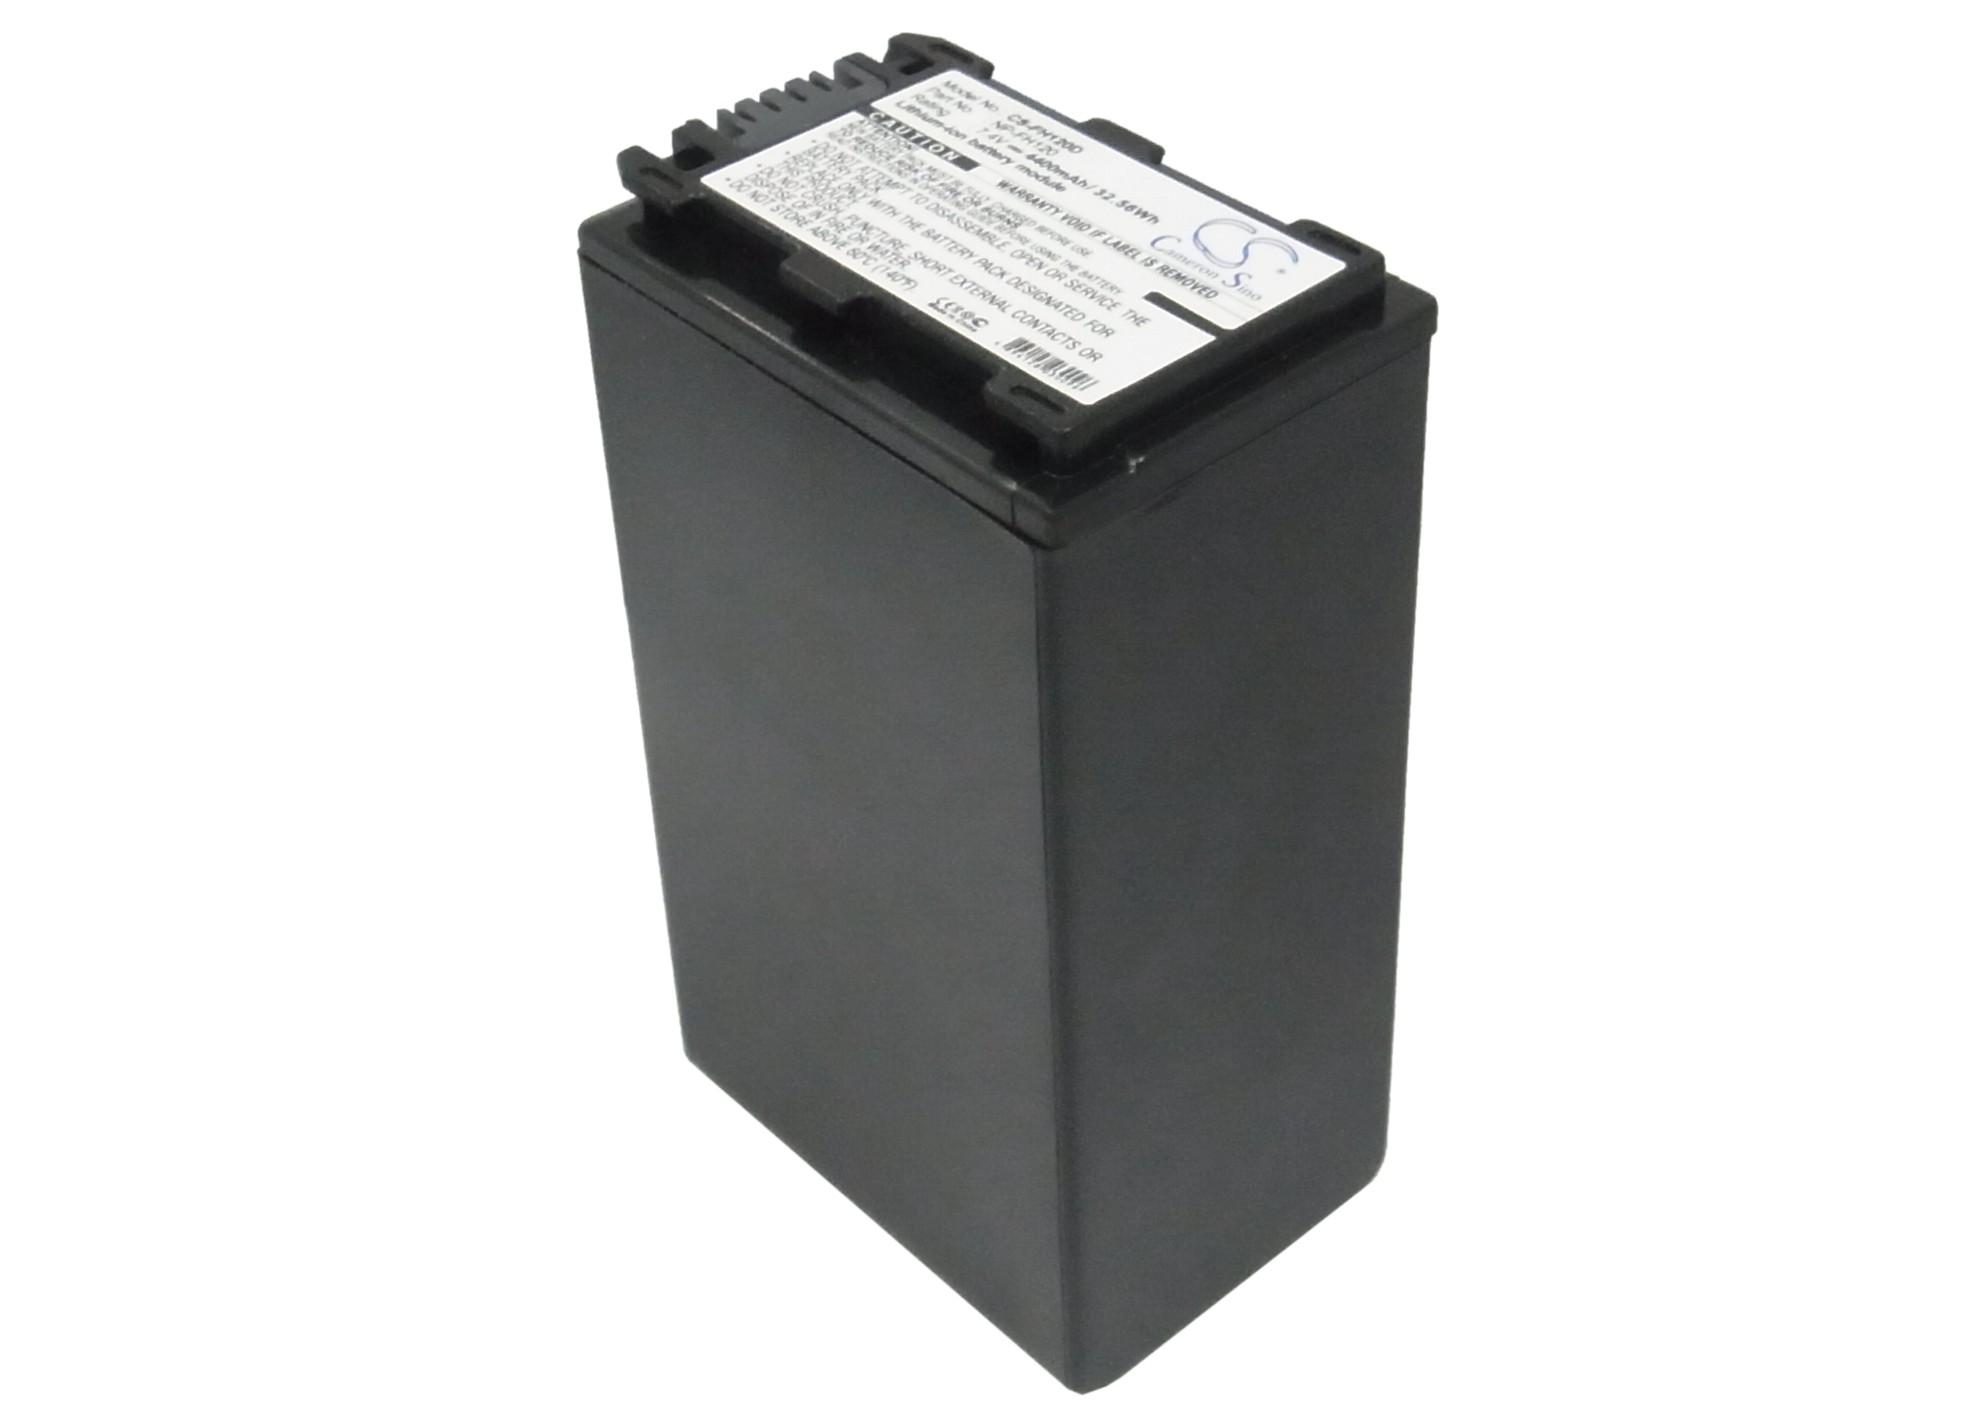 Cameron Sino baterie do kamer a fotoaparátů pro SONY DCR-DVD203E 7.4V Li-ion 4400mAh černá - neoriginální